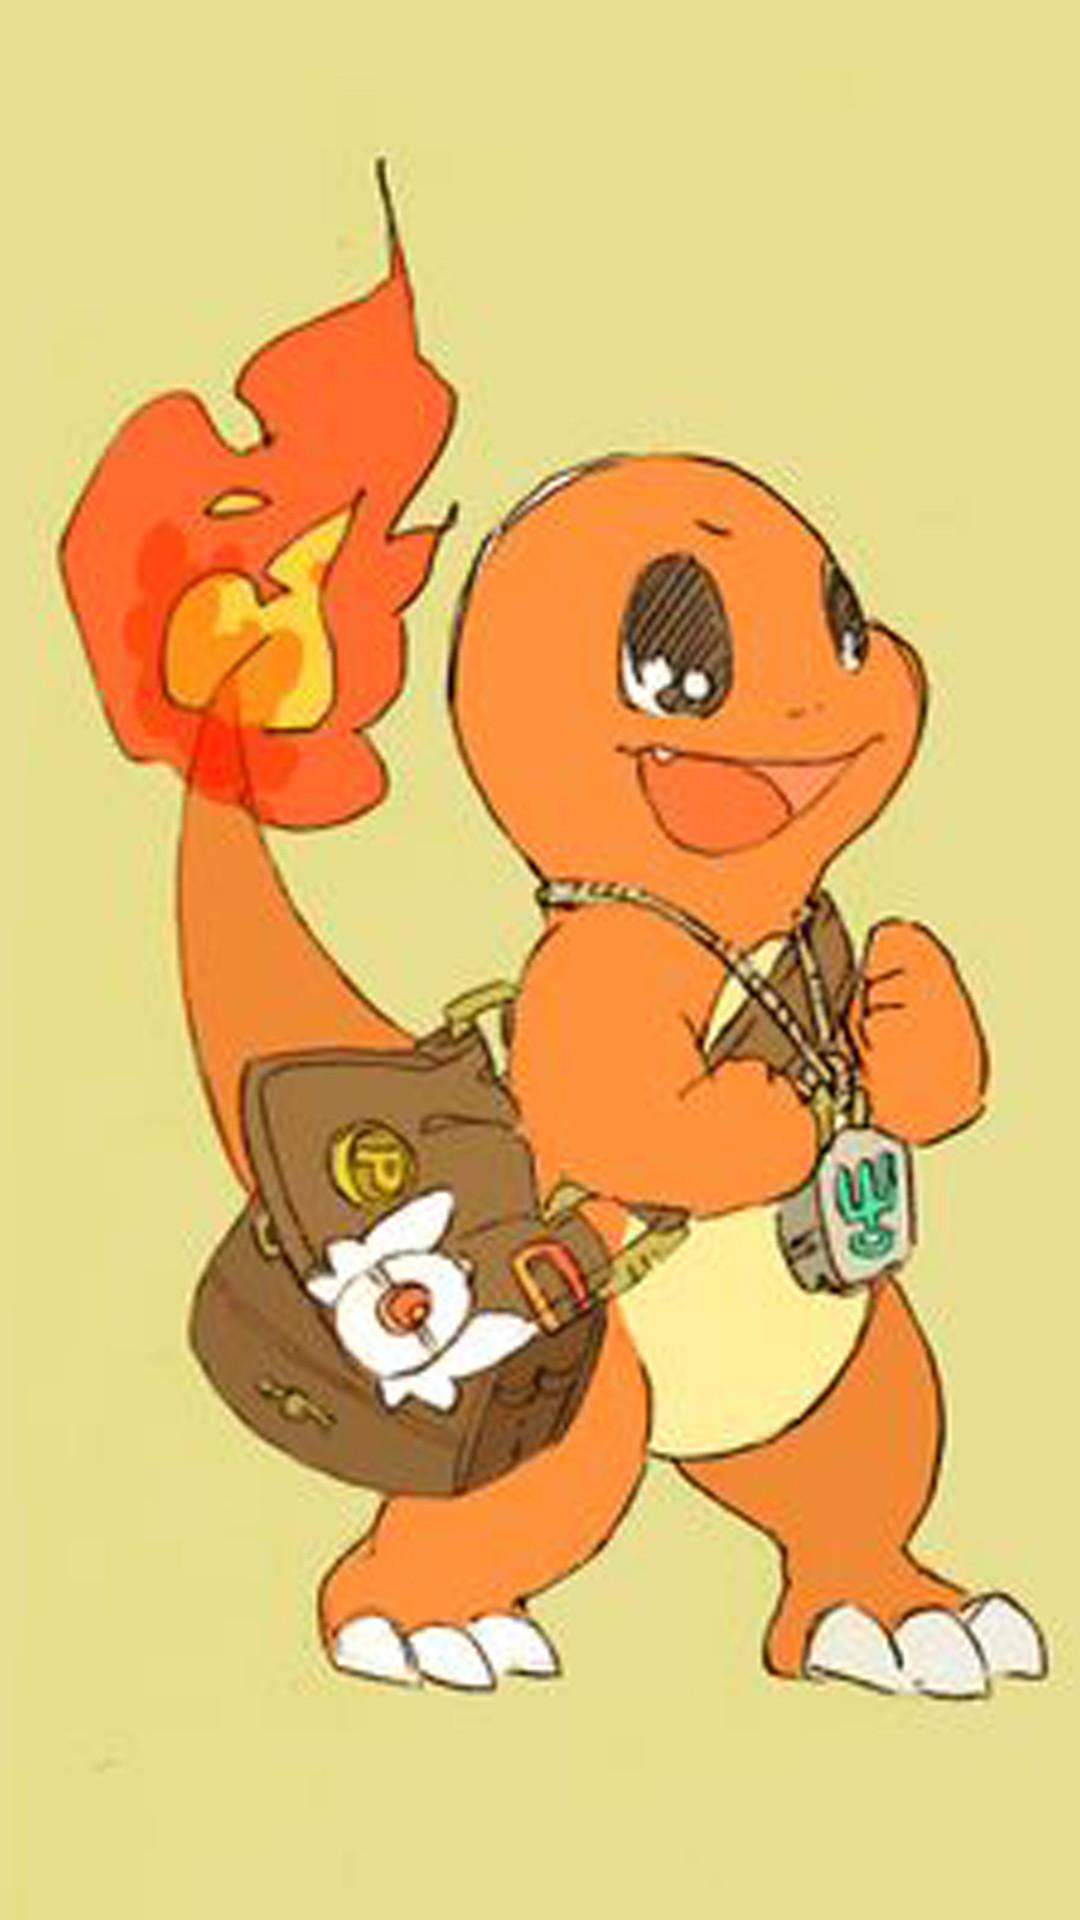 Charmander Pokemon Go whatsapp wallpaper iphone 6 plus